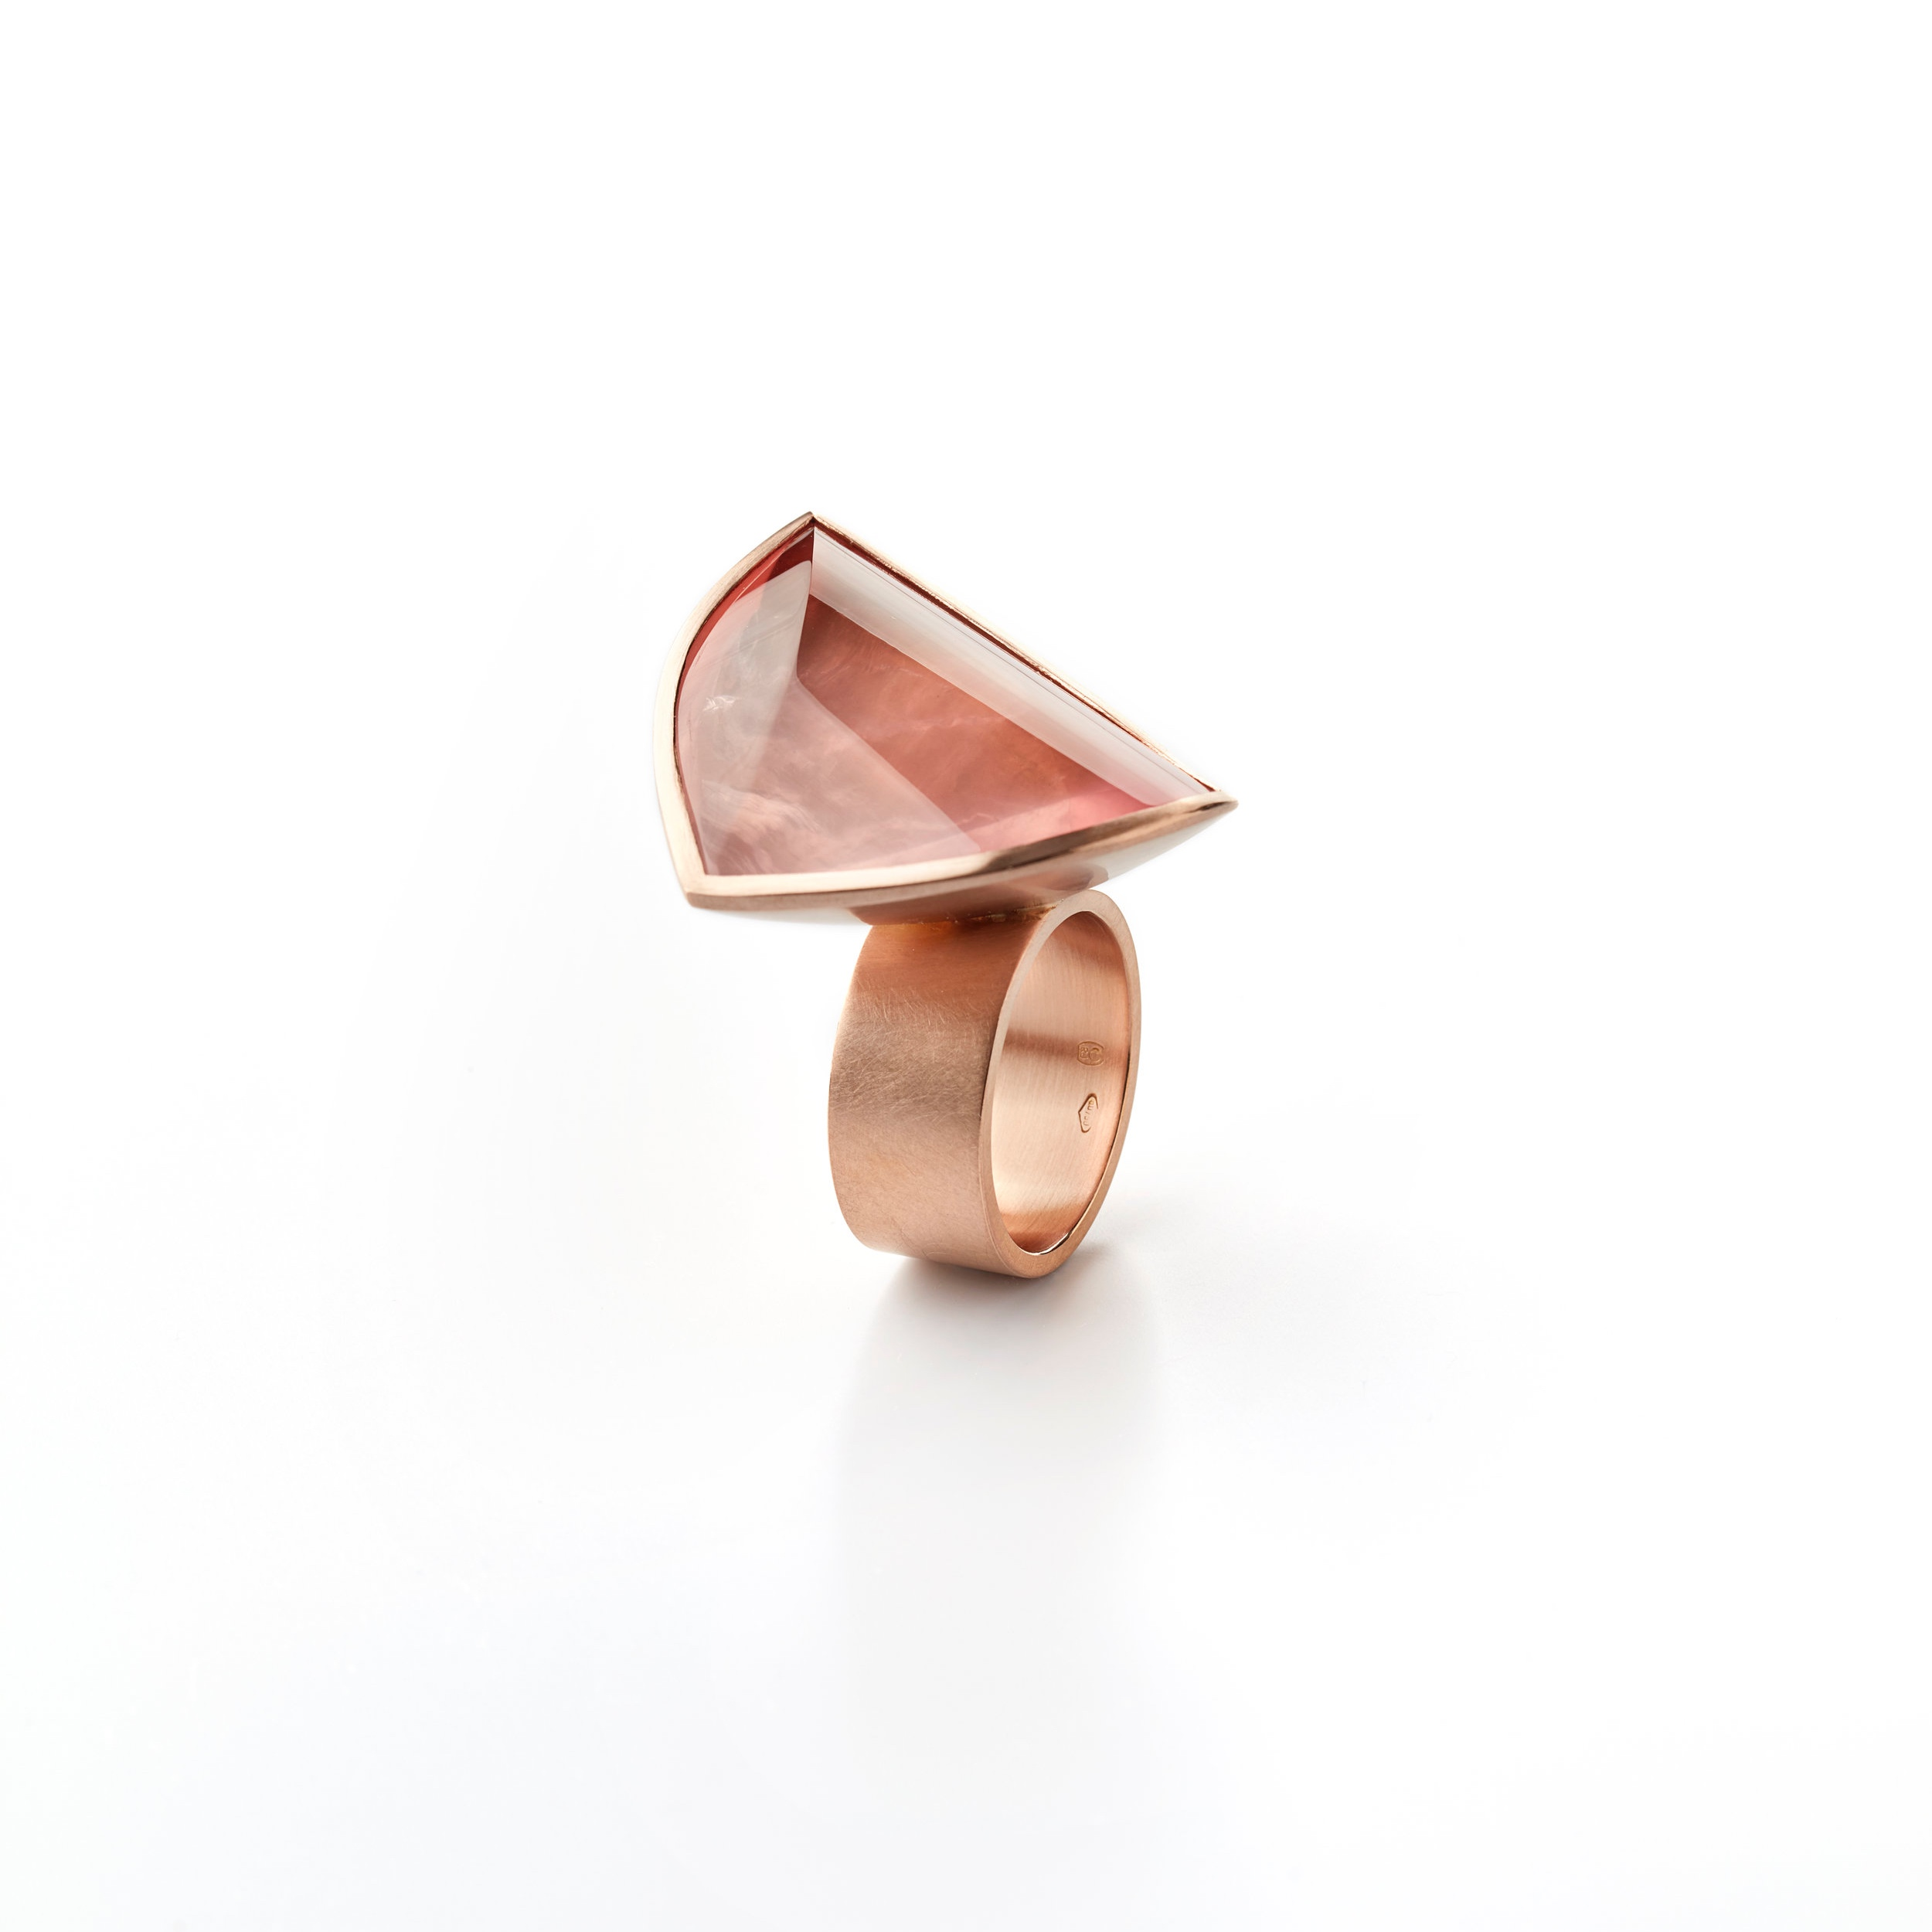 Ring Hidden Secret VII, 18k rood goud+rozenkwarts 41,11 ct, Rembrandt Jordan.jpg